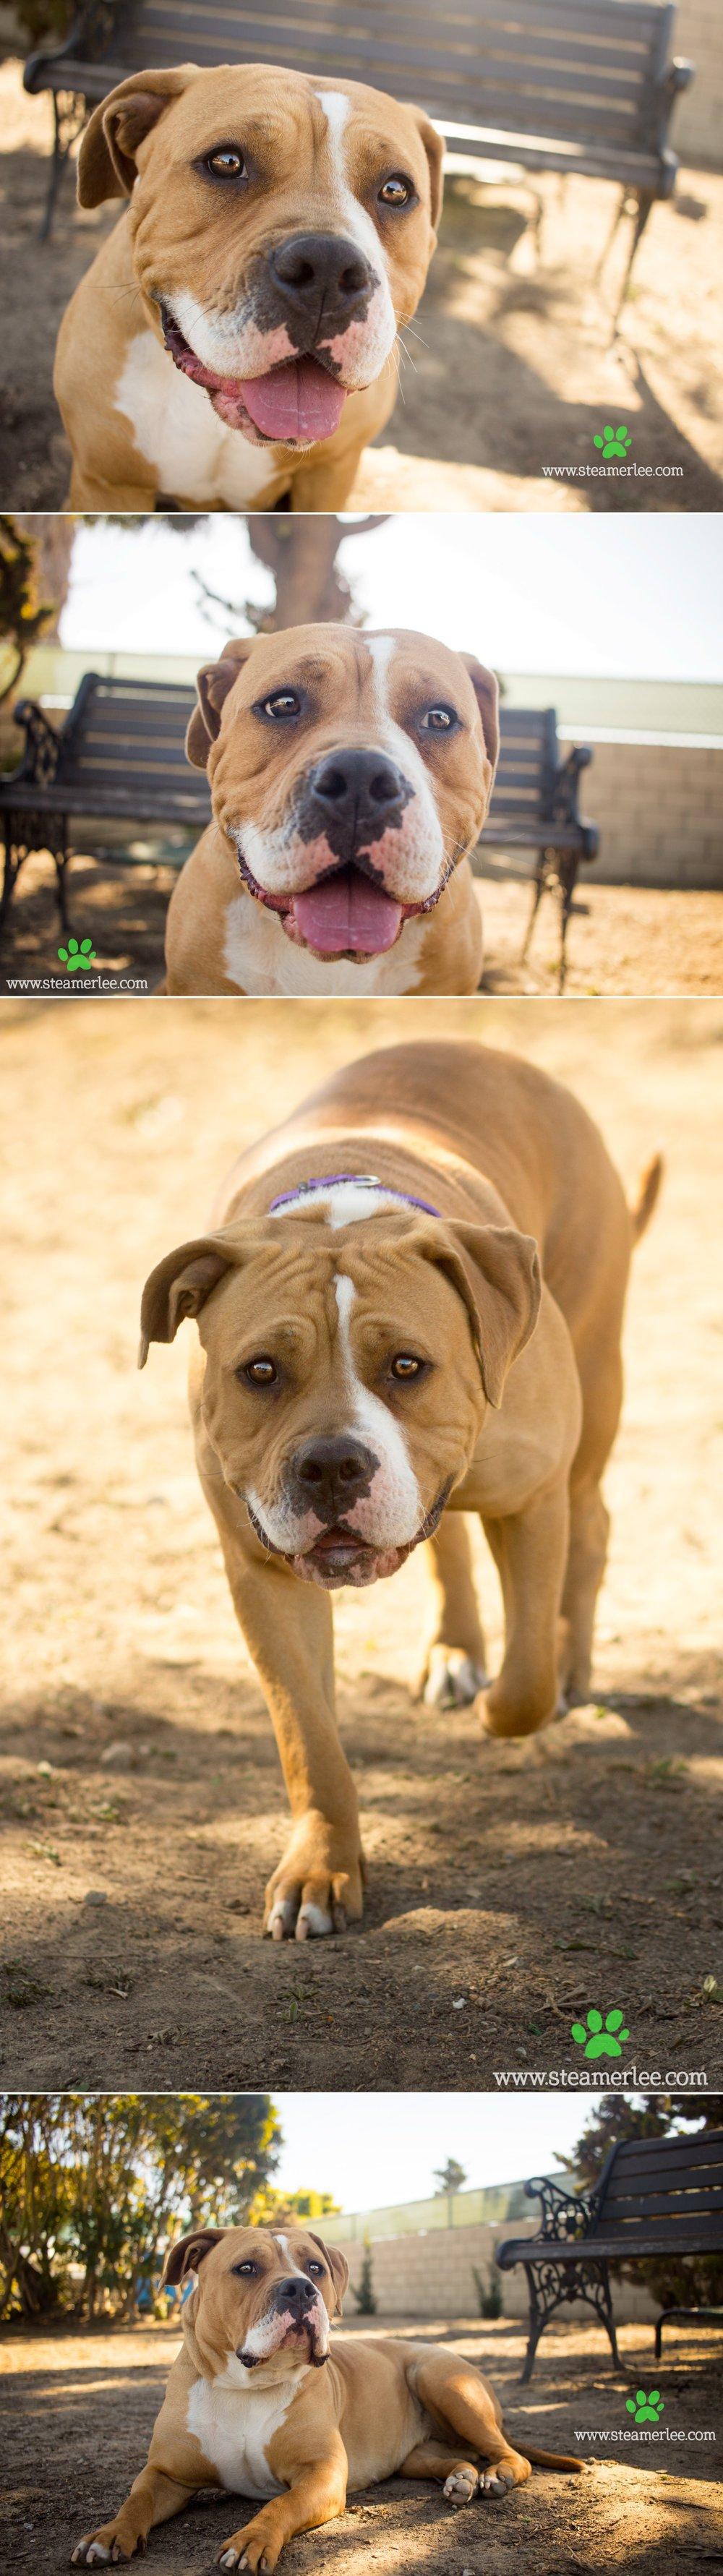 18 Steamer Lee Dog Photography - Seal Beach Animal Care Center.JPG